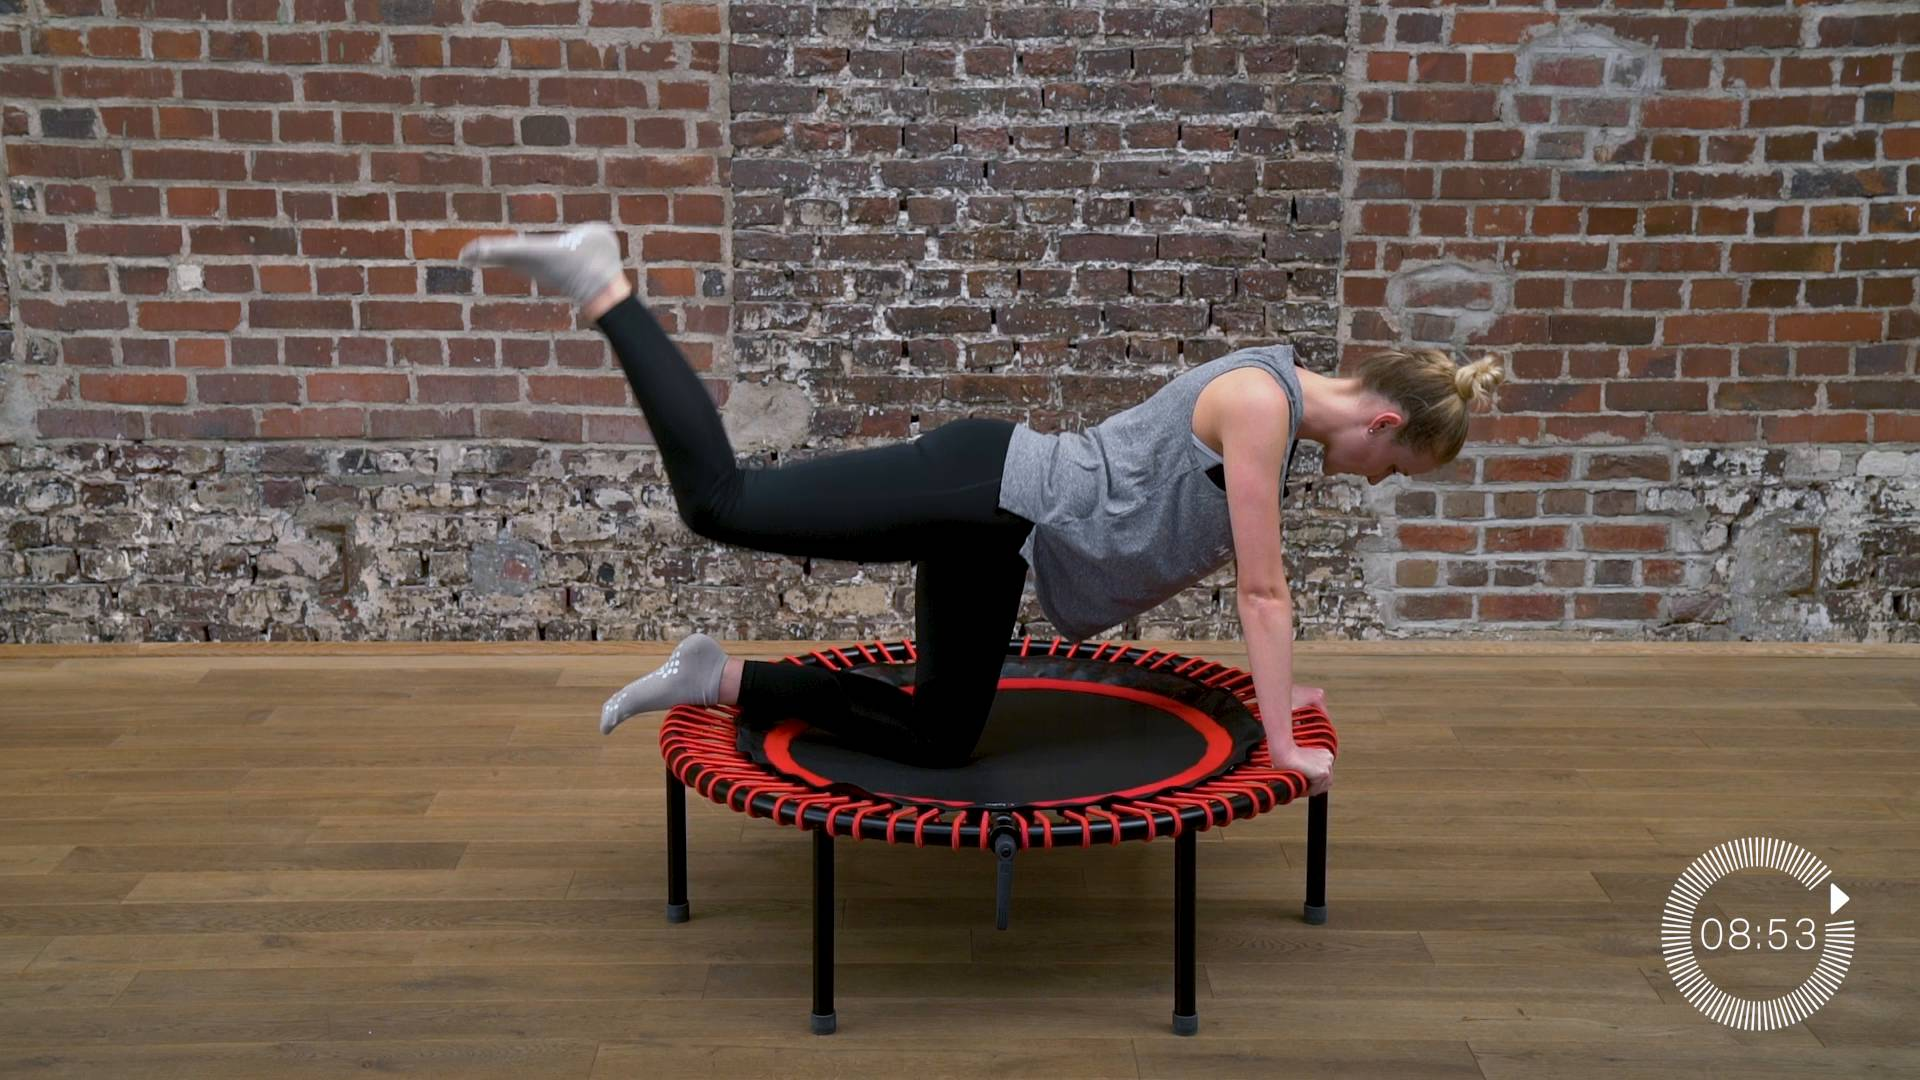 flacher bauch straffe beine fester po mini trampolin training video bellicon home. Black Bedroom Furniture Sets. Home Design Ideas